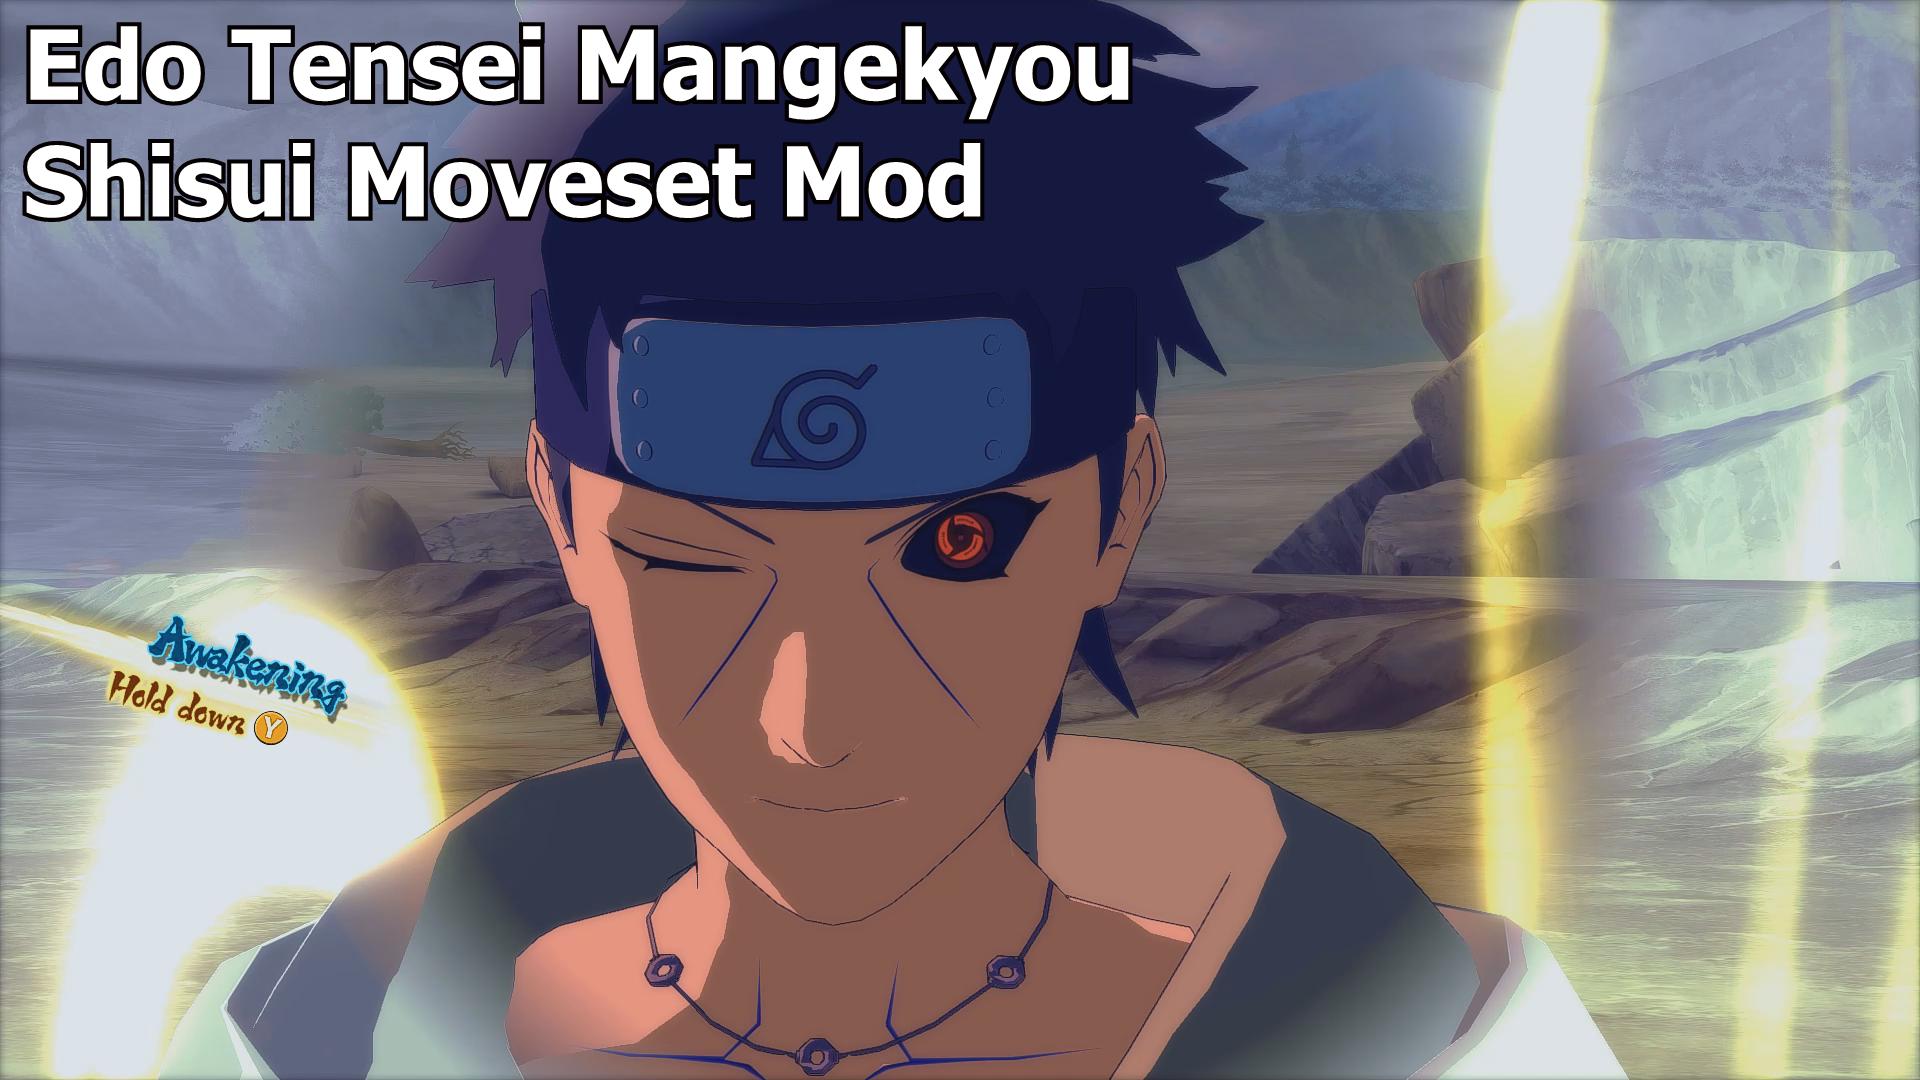 Naruto Ninja Storm 4 Road to Boruto PC MOD 60 FPS - Edo Tensei